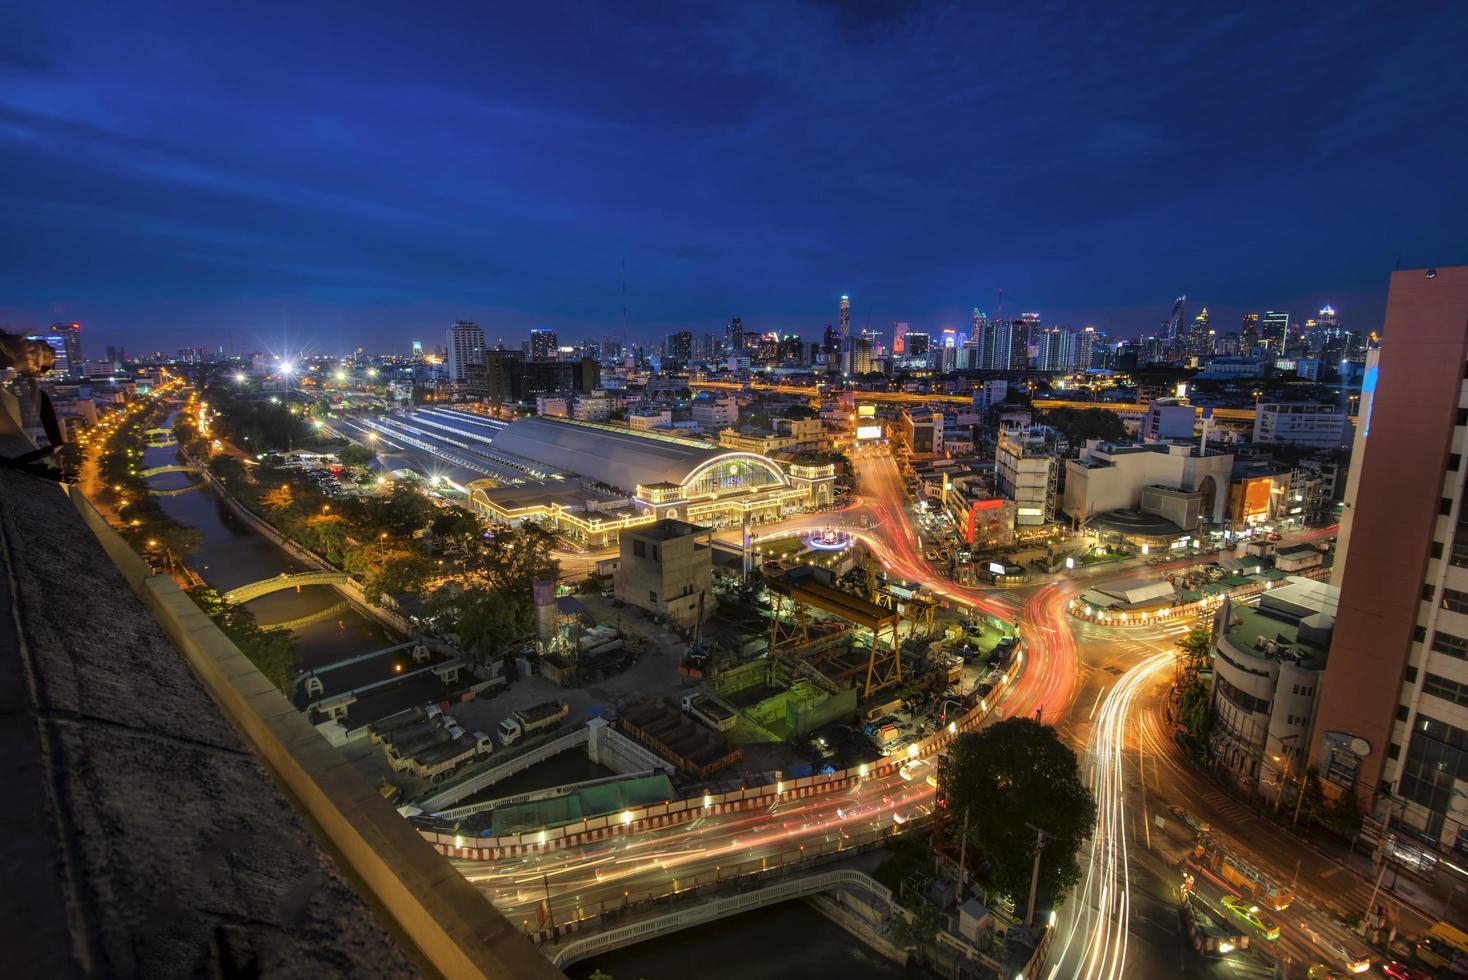 La gare de Bangkok la nuit en Thaïlande photo